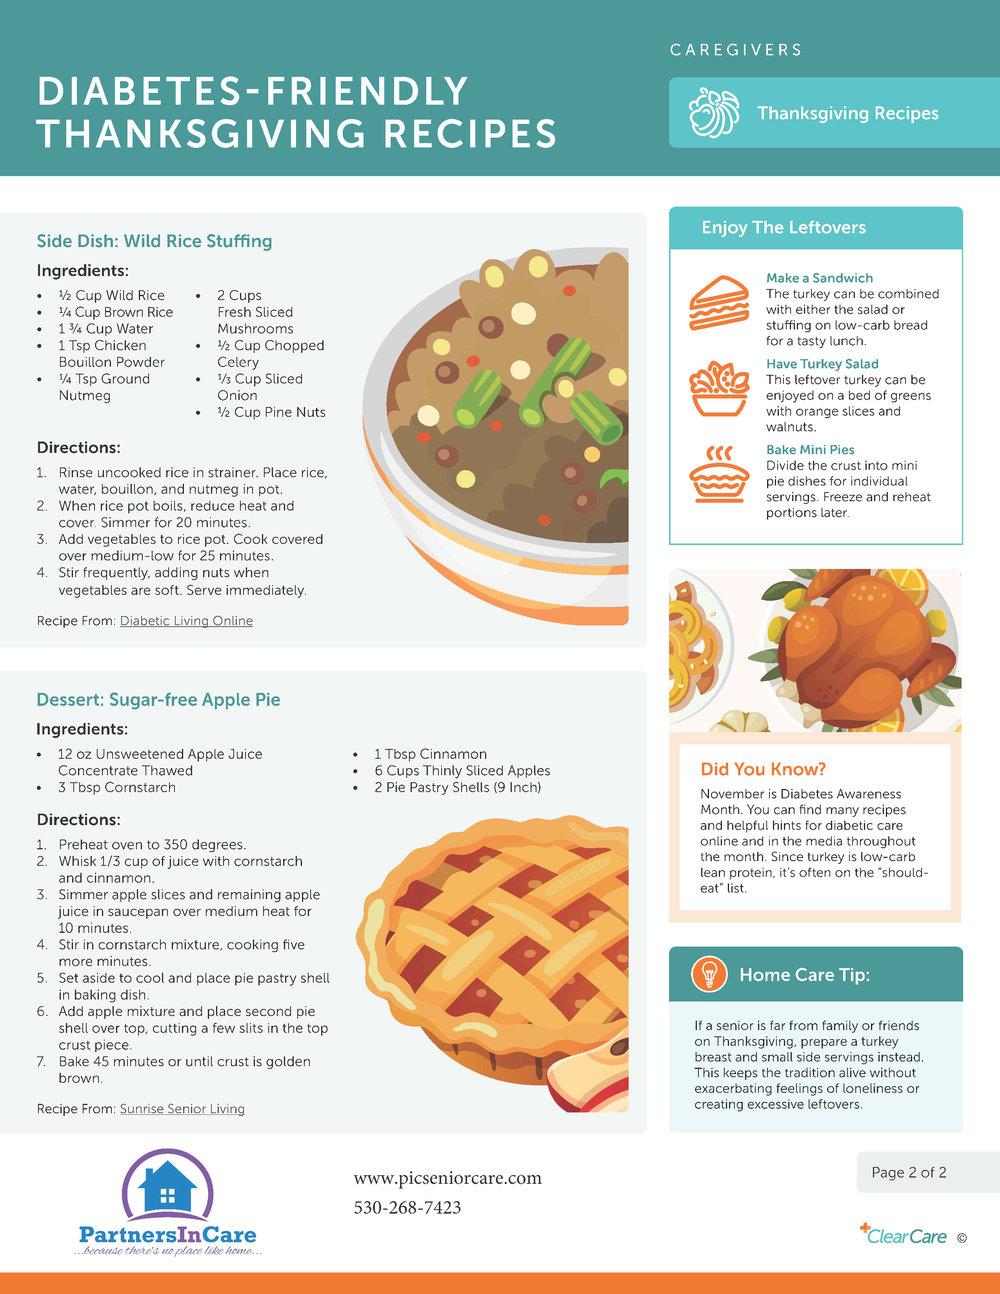 Diabetes Recipes for Thanksgiving pg. 2-02-01.jpg